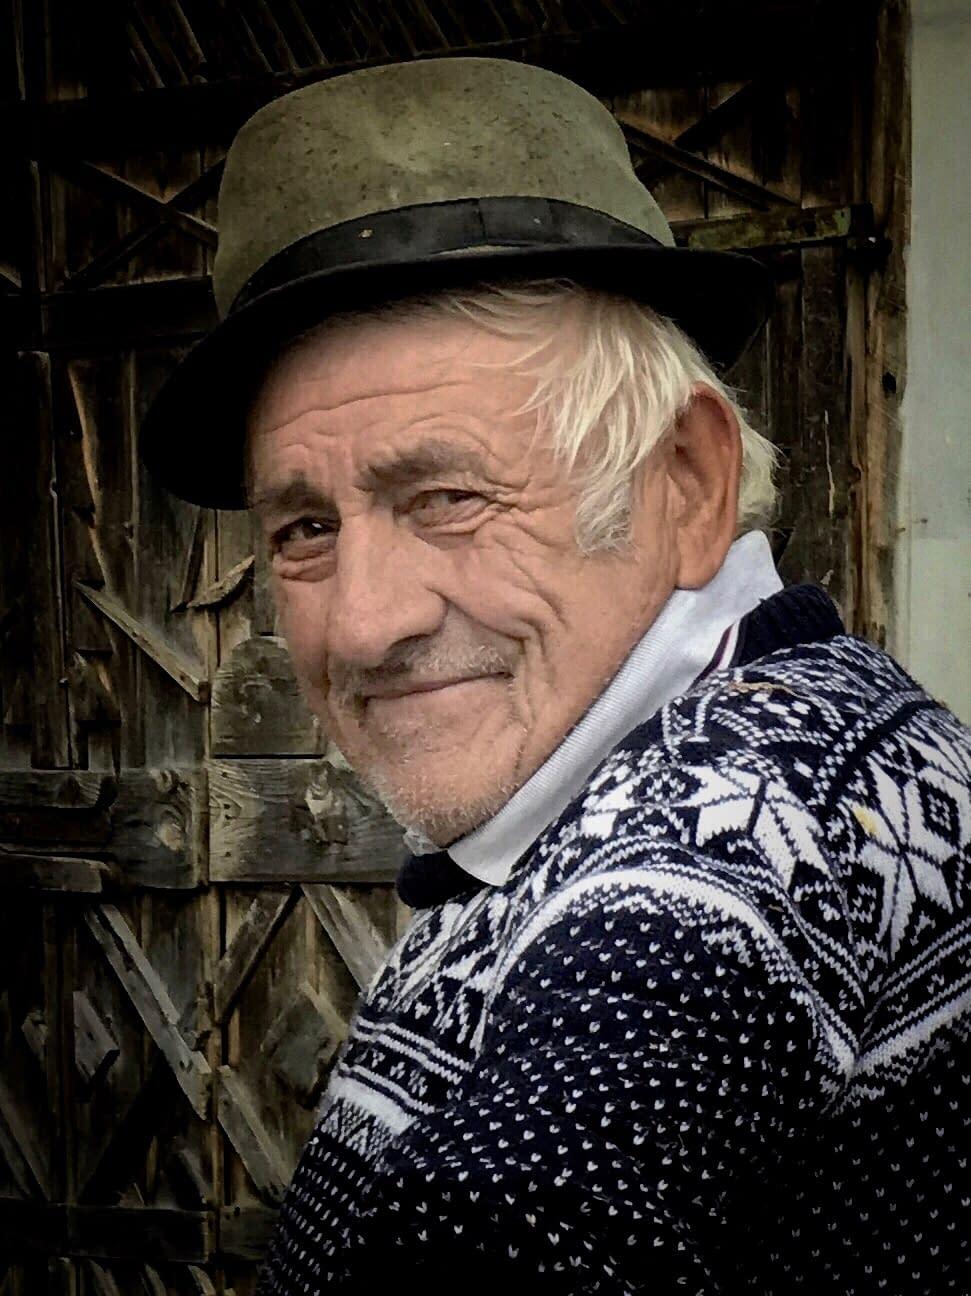 Gospodar Timotei Filip, Cupseni, Romania, portrait by Malin Skinnar